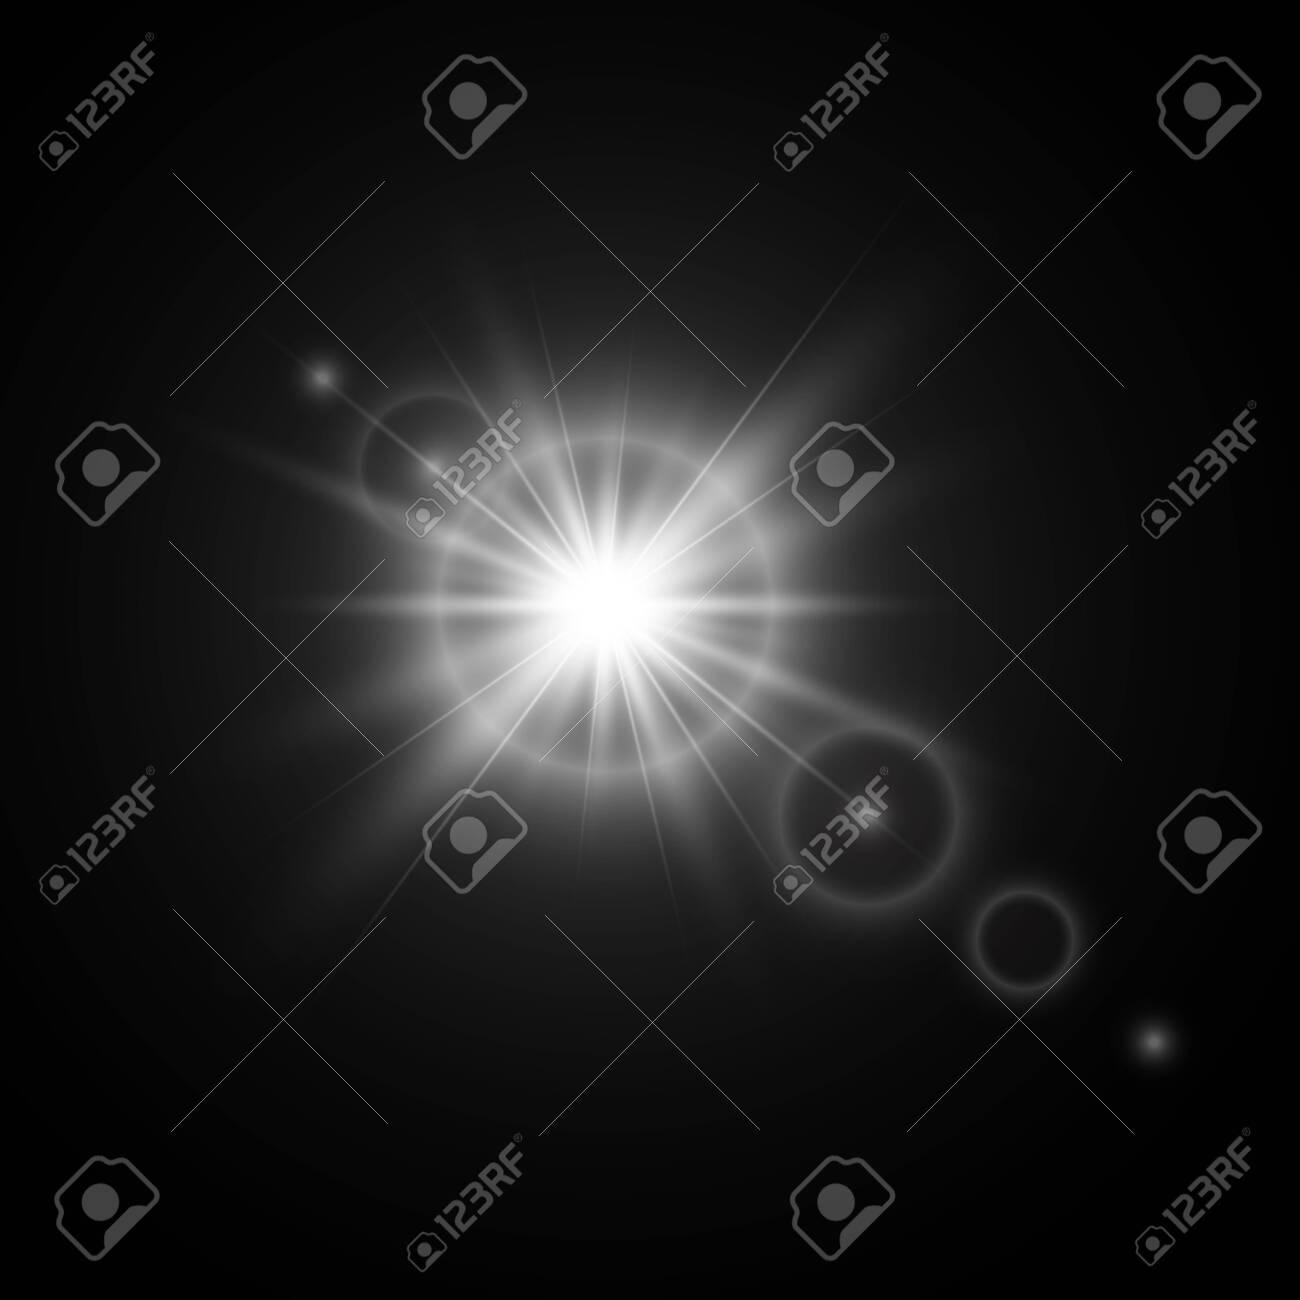 Light effects. White glowing light burst explosion. - 148909944